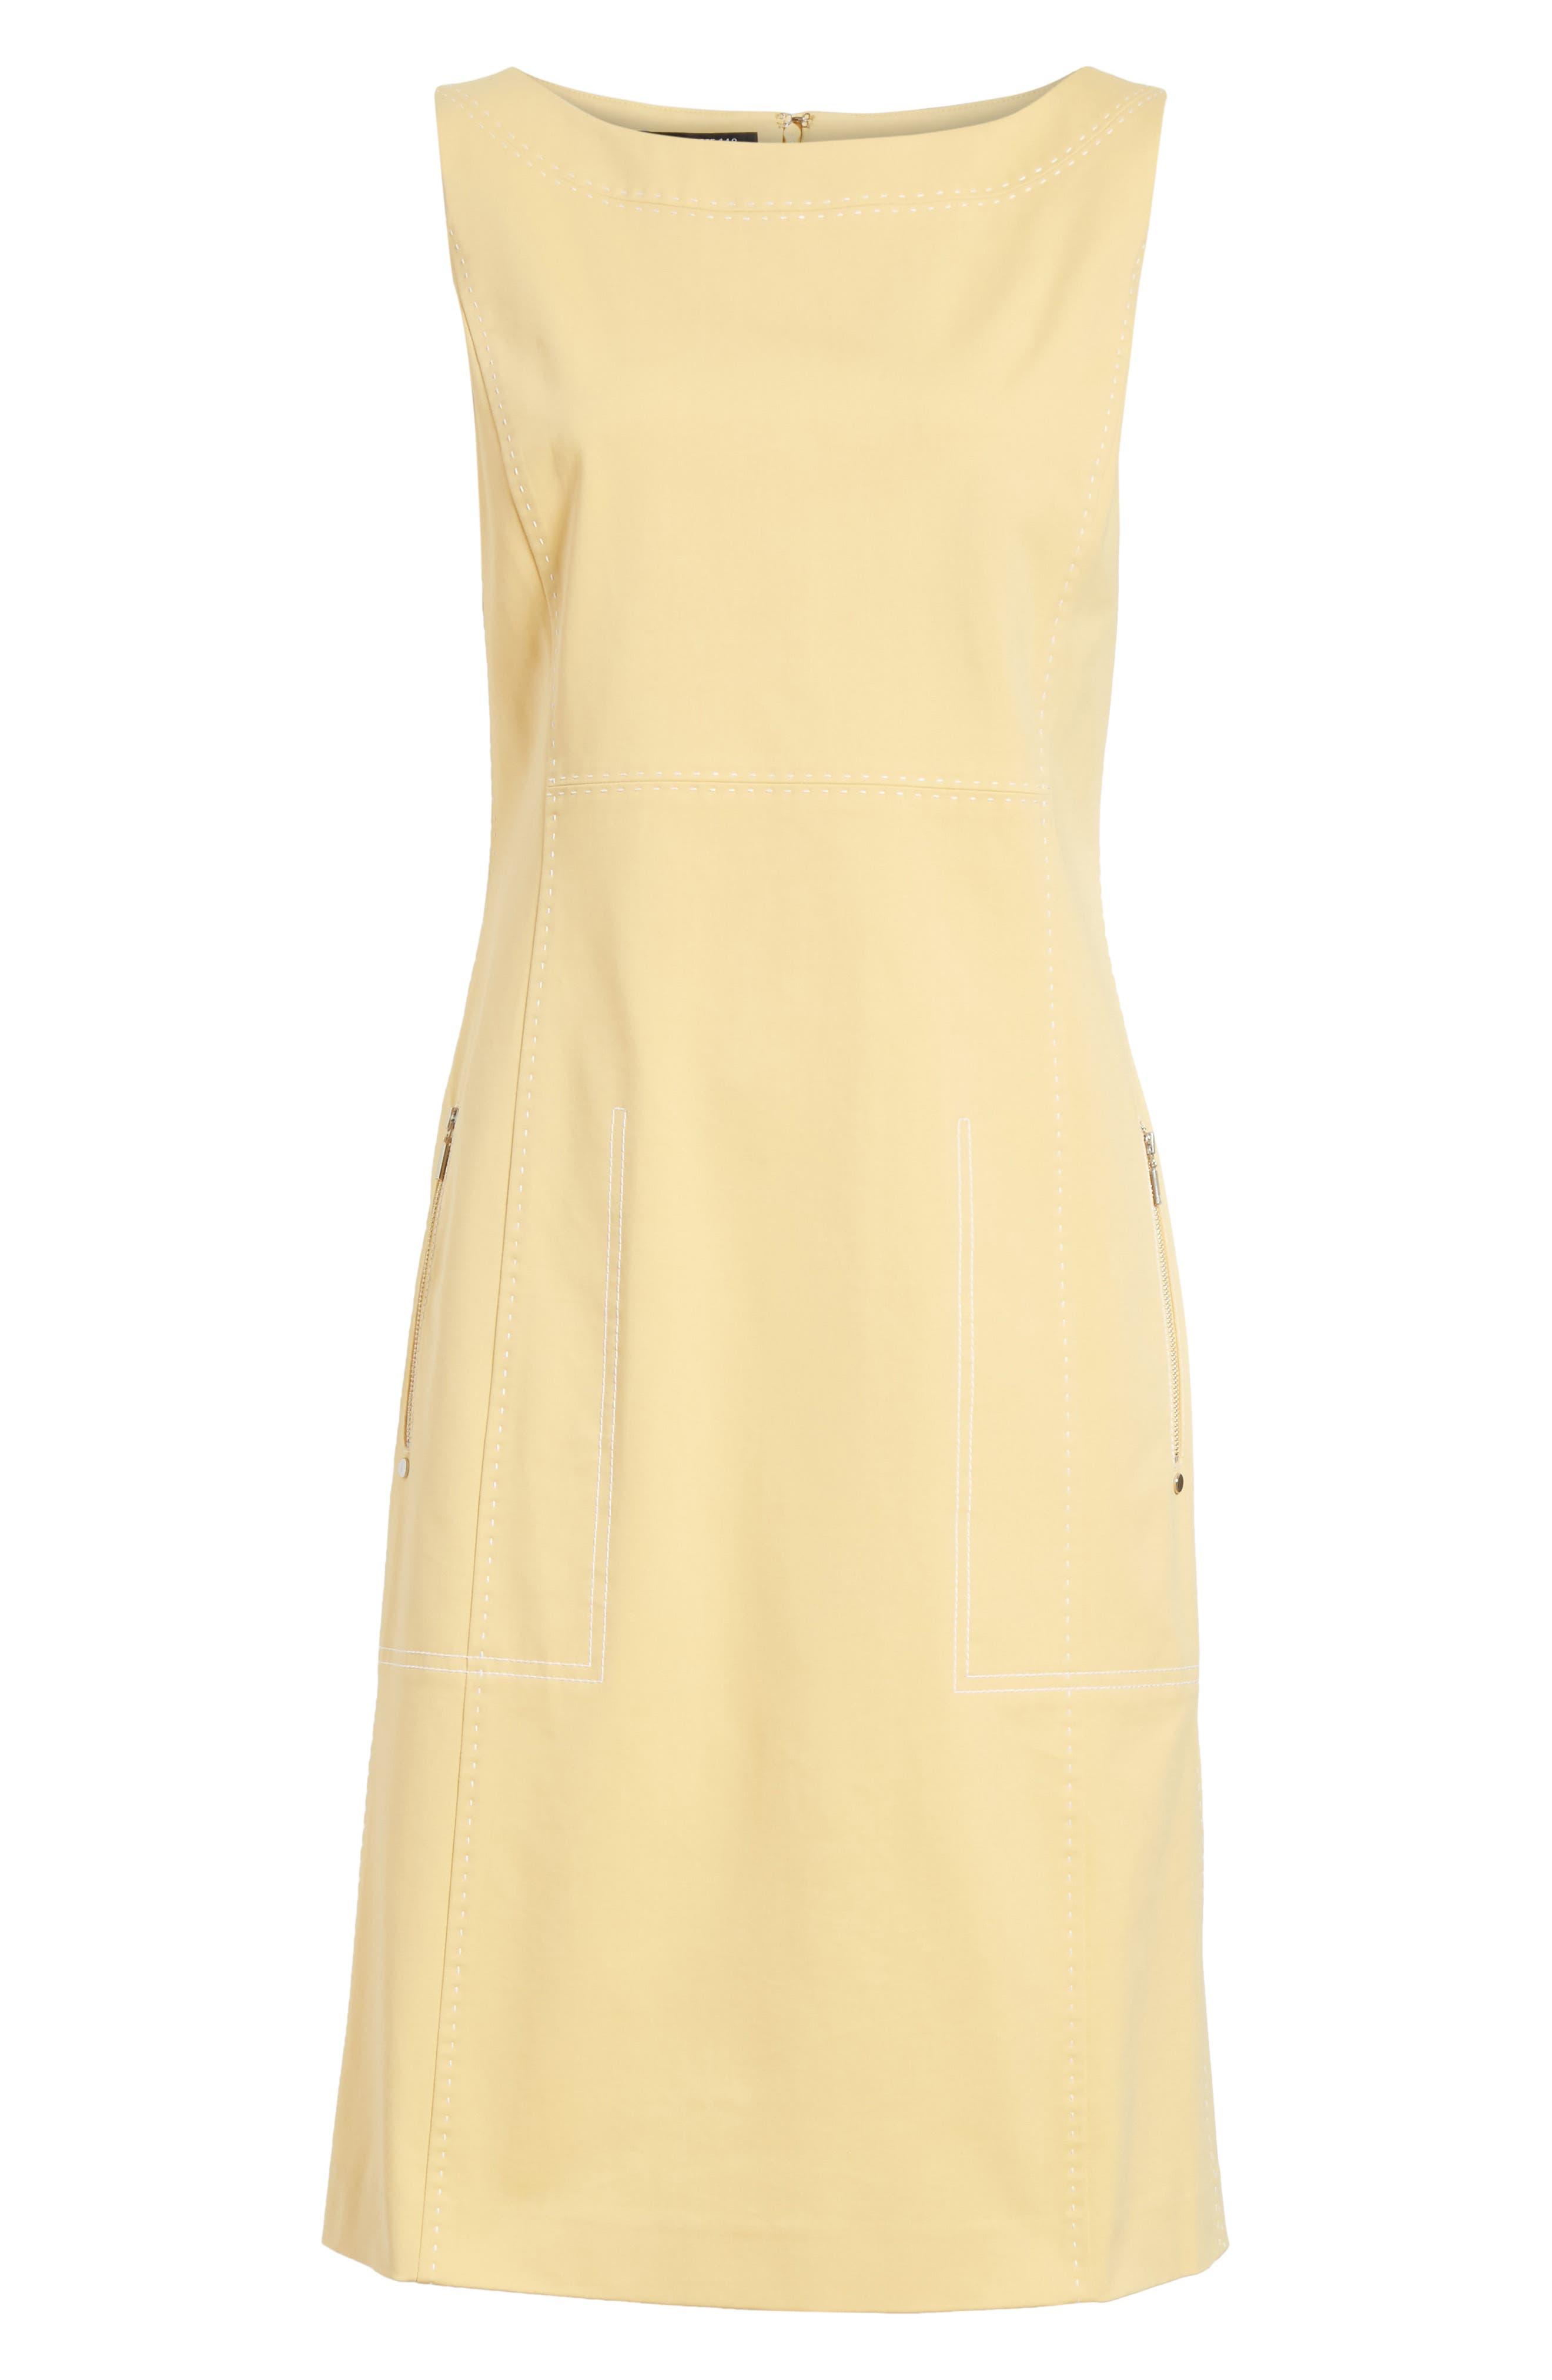 Paxton Sleeveless Sheath Dress,                             Alternate thumbnail 7, color,                             Sienna Yellow